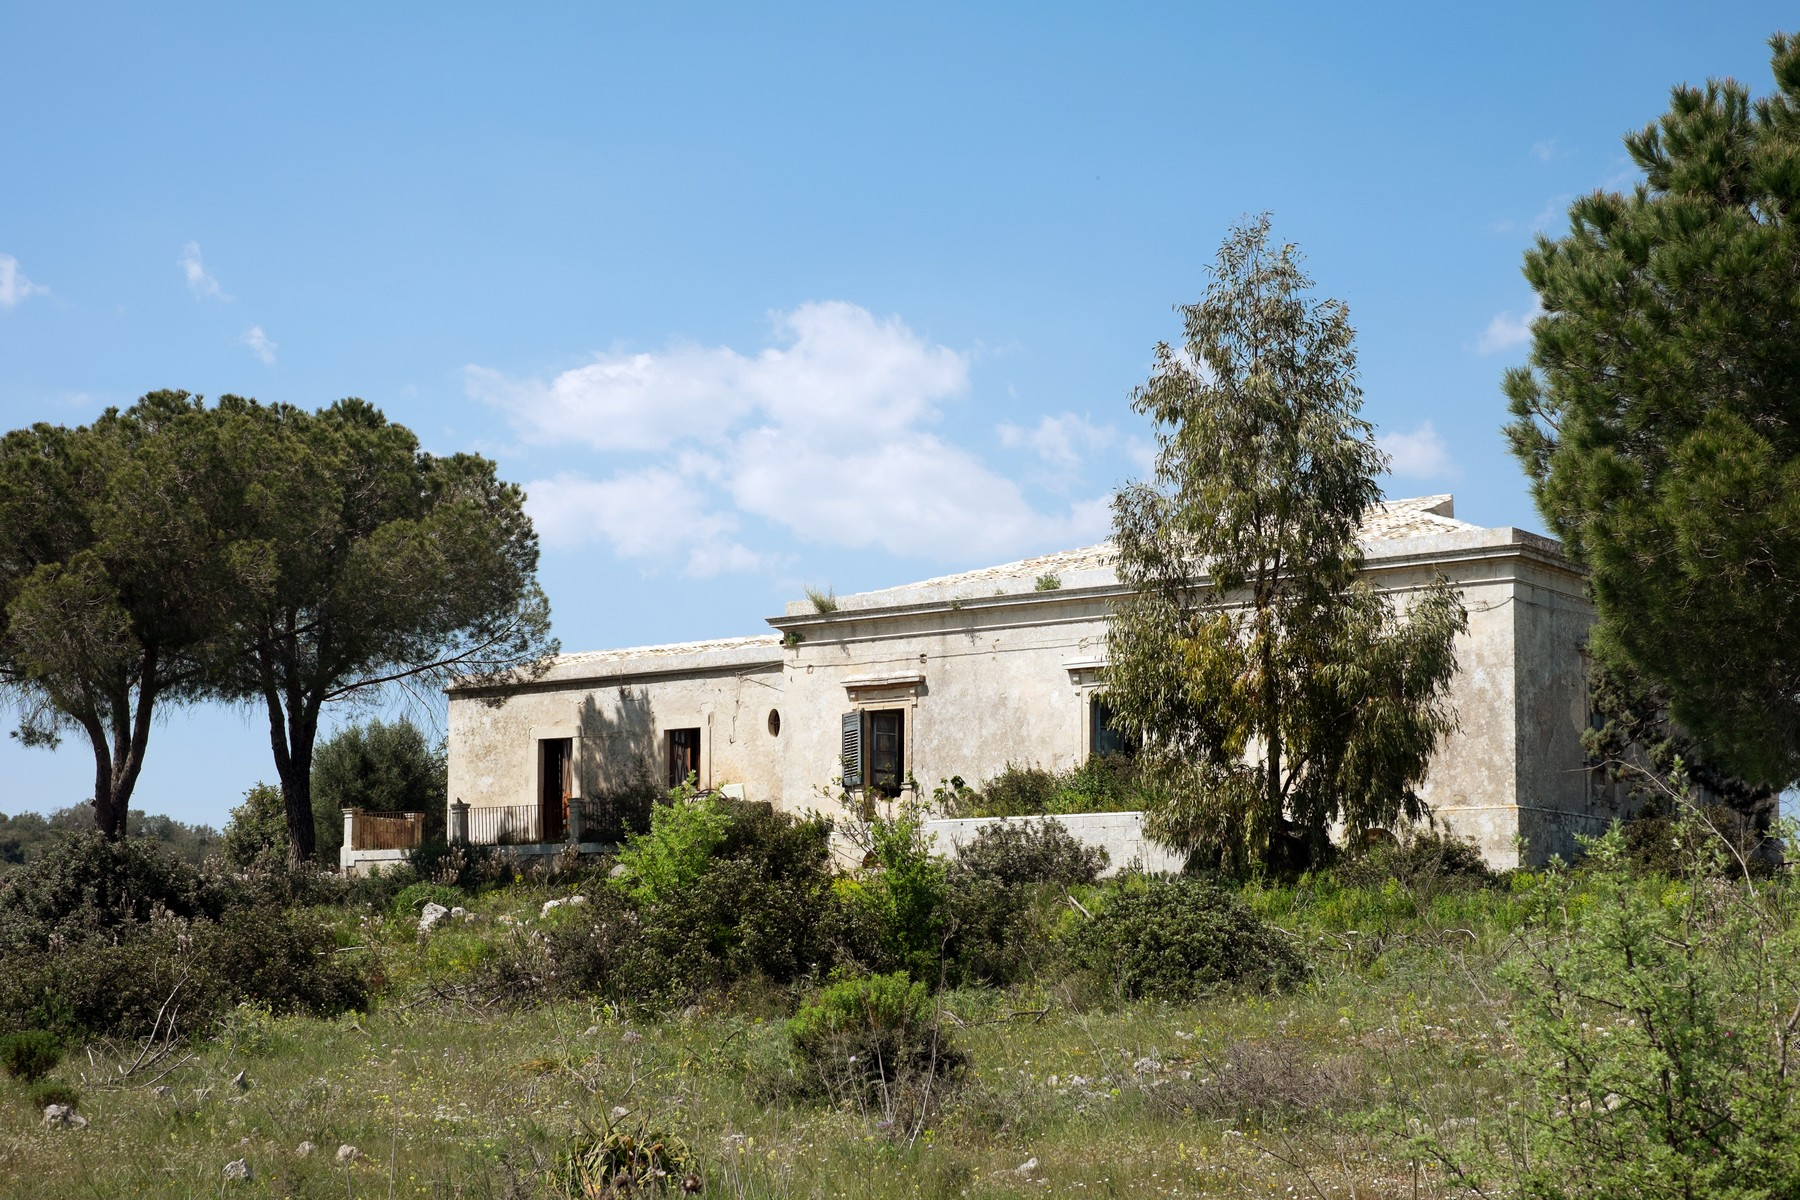 Casa indipendente in Vendita a Noto: 5 locali, 1000 mq